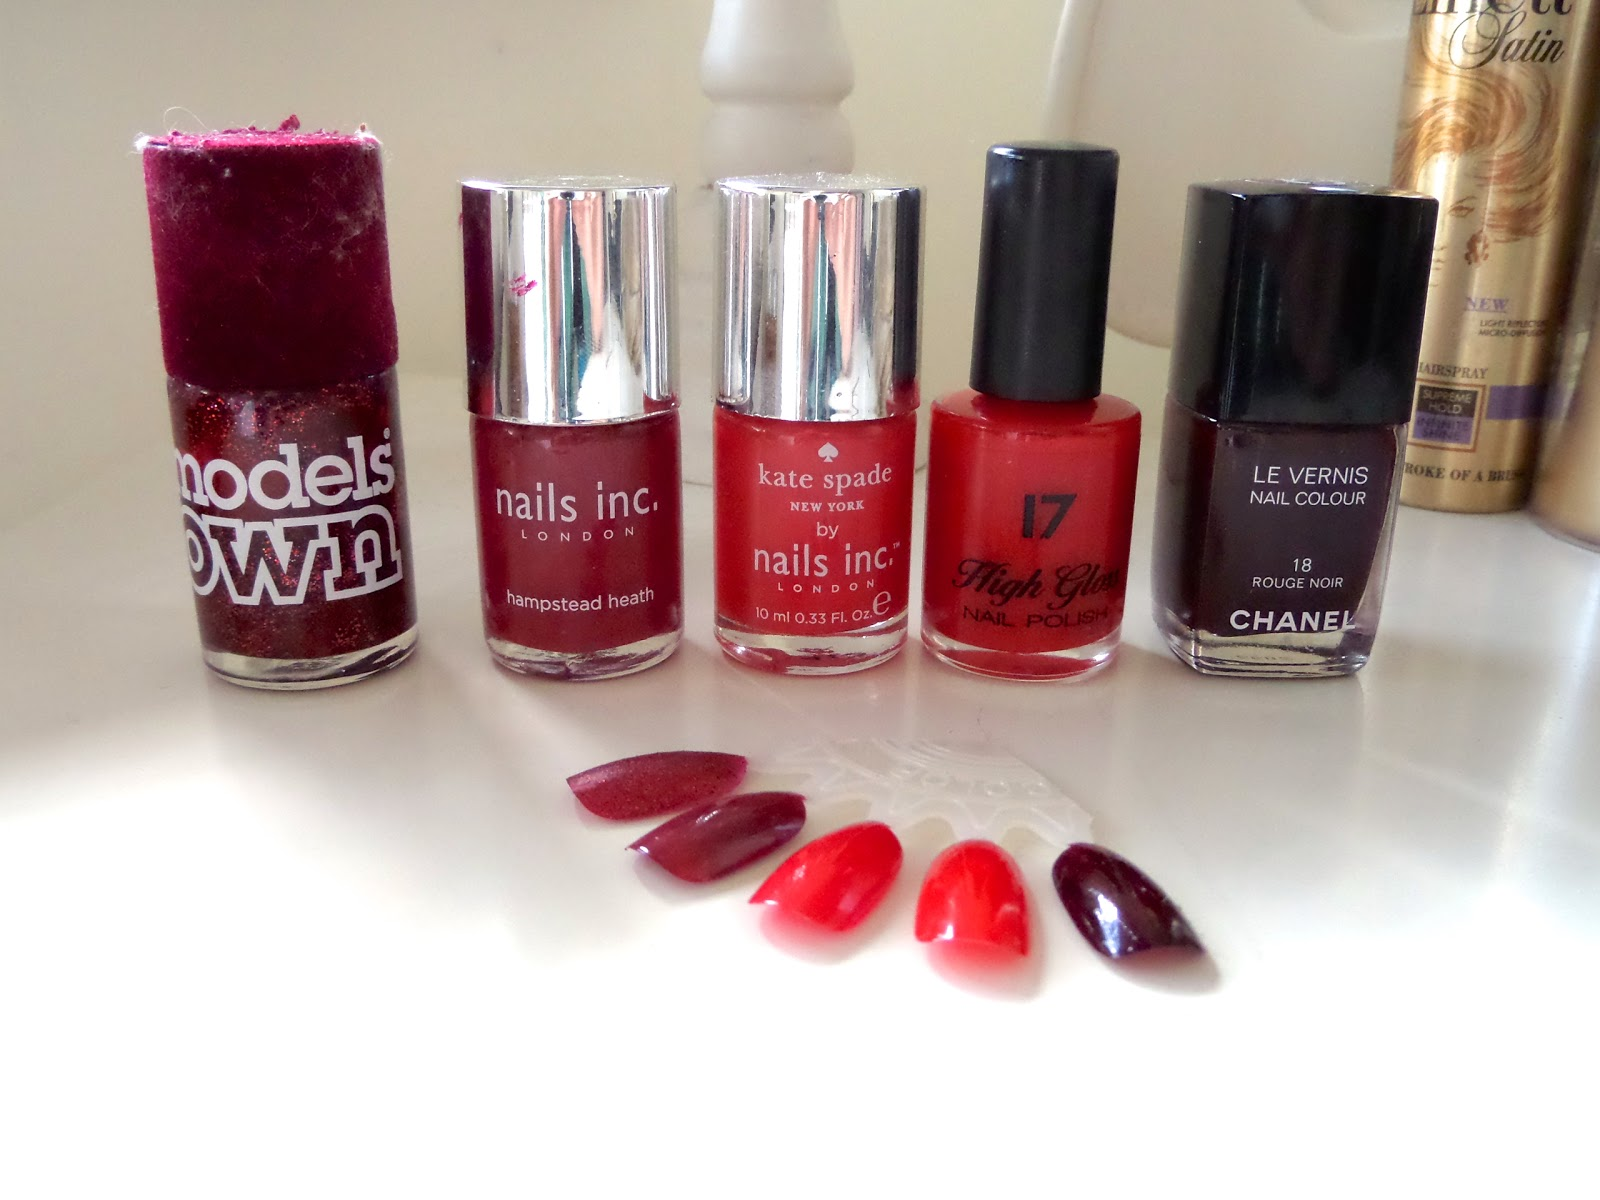 Models Own Sardonyx, Nails inc Hampstead Heath, Nails inc Big Apple Red, Seventeen/17 High Gloss & Chanel Rouge Noir